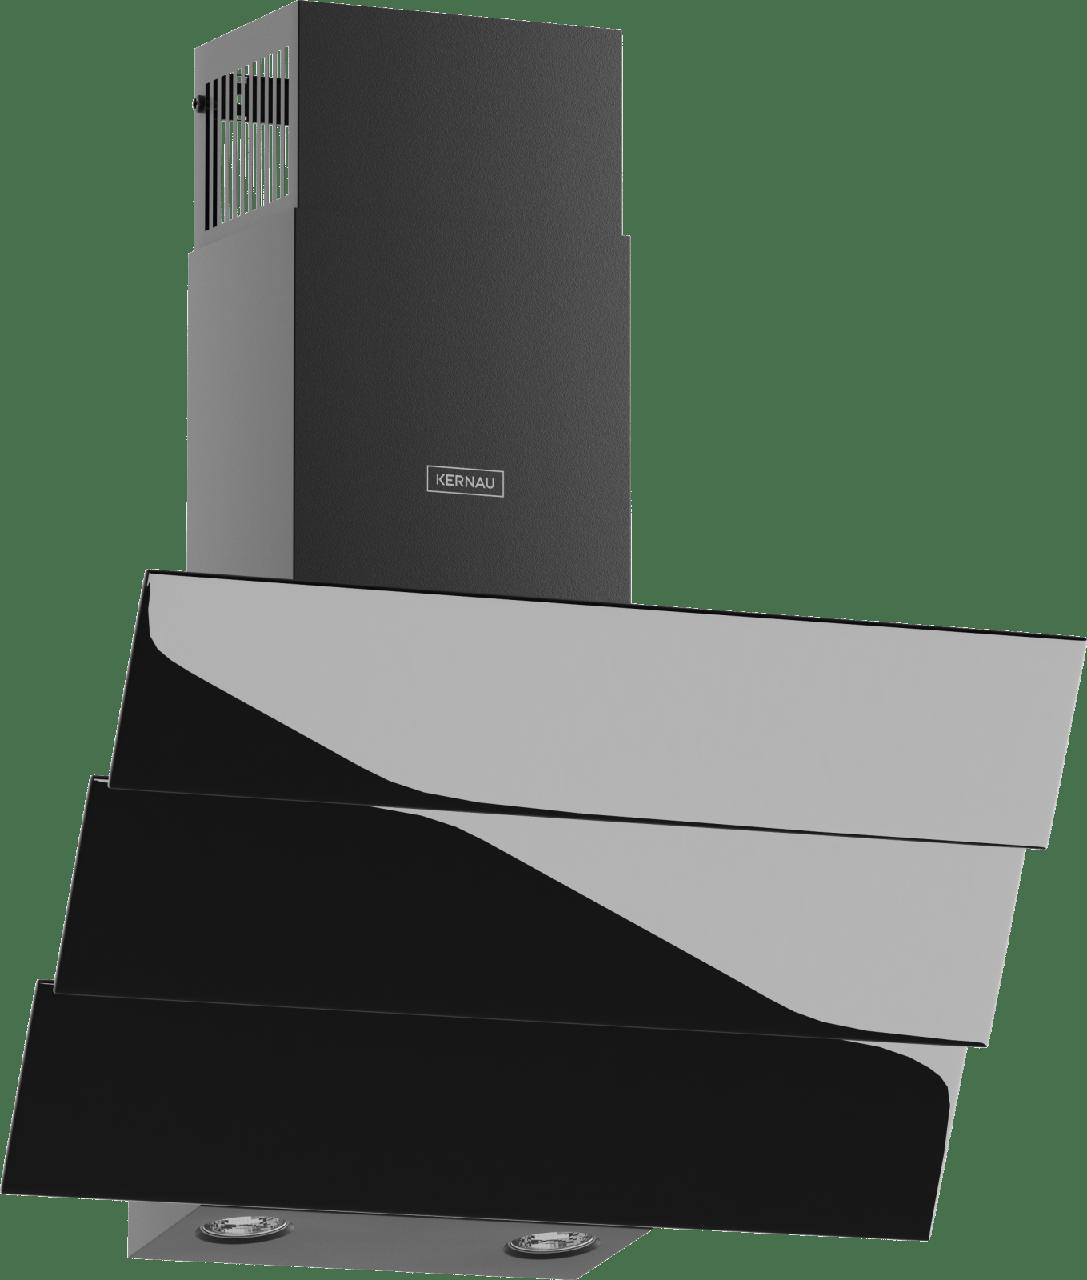 Кухонная вытяжка, настенная Kernau KCH 3591.1 B